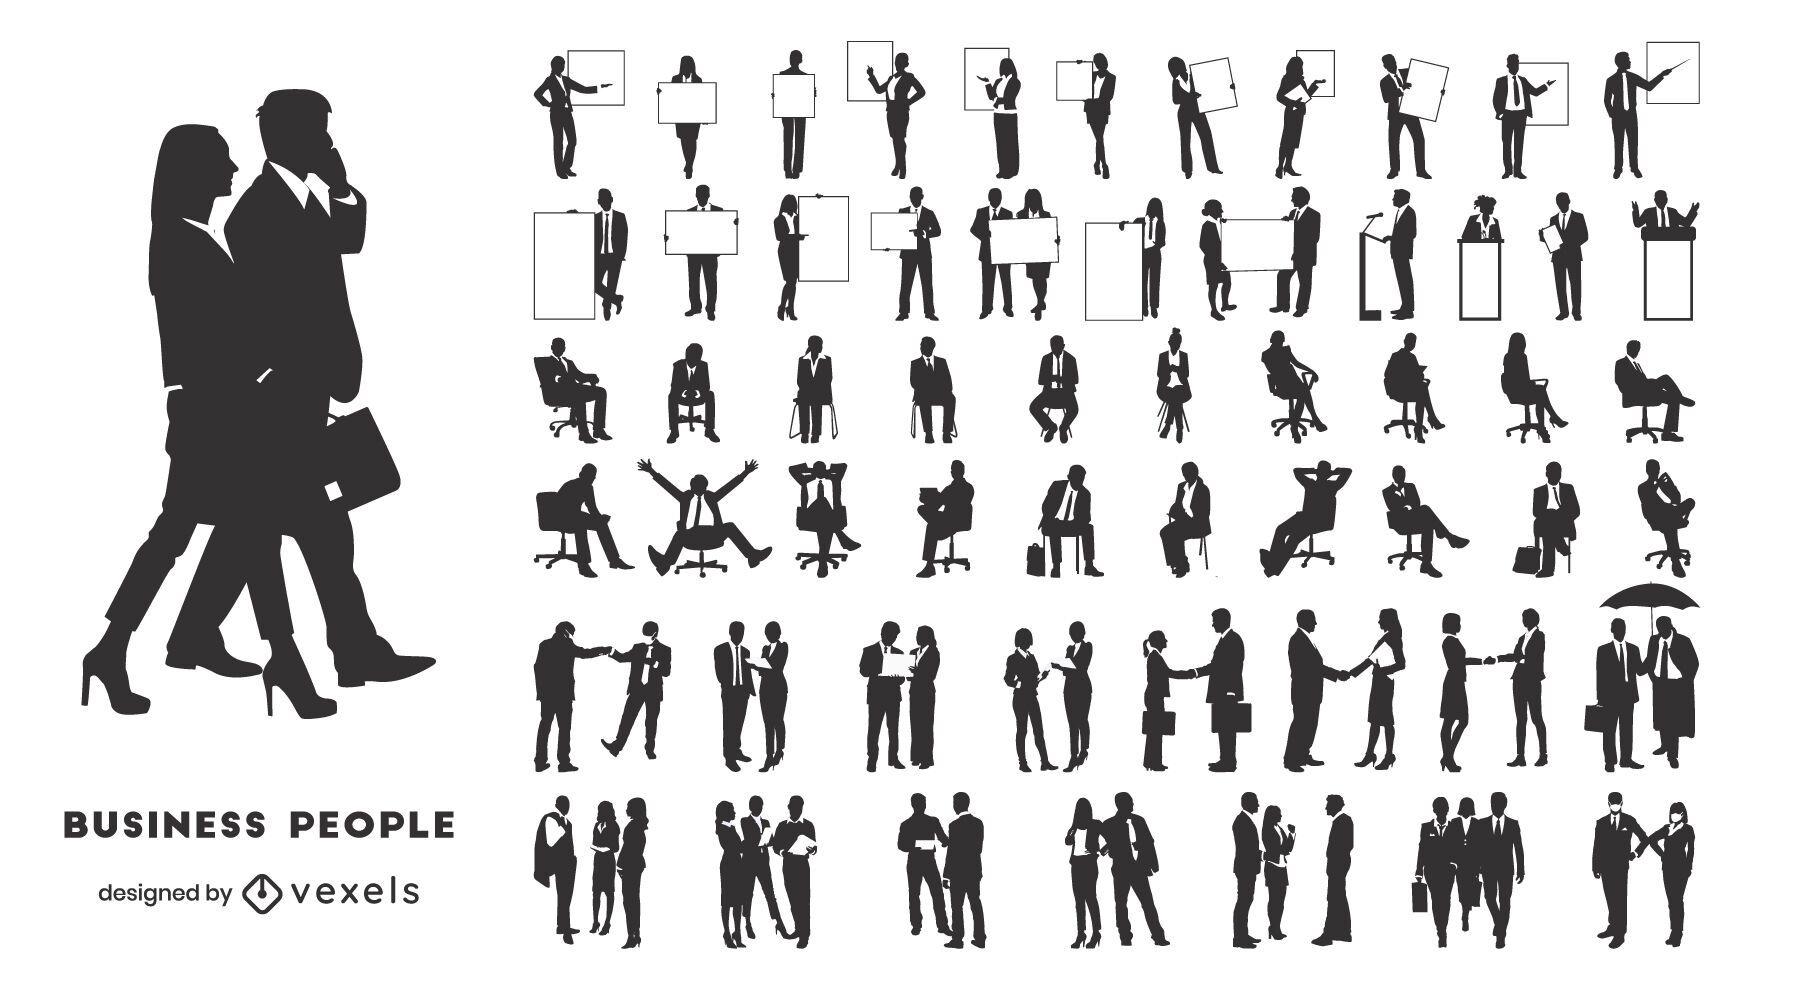 Colección de silueta de personas de negocios